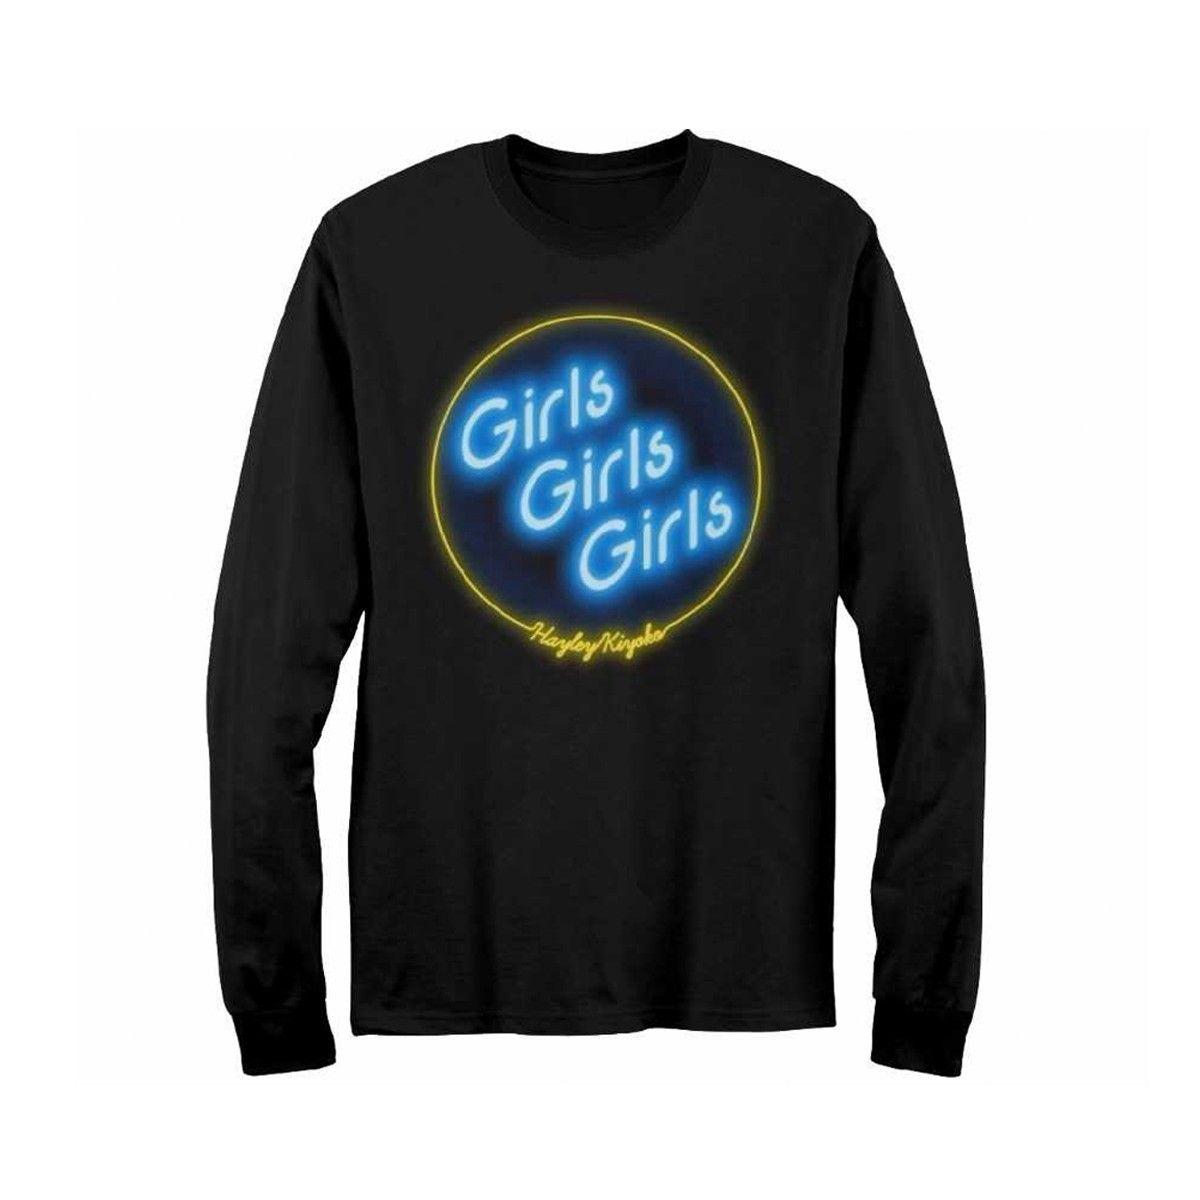 3094a4839 Neon Circle Longsleeve T-Shirt - Hayley Kiyoko - Atlantic Records ...